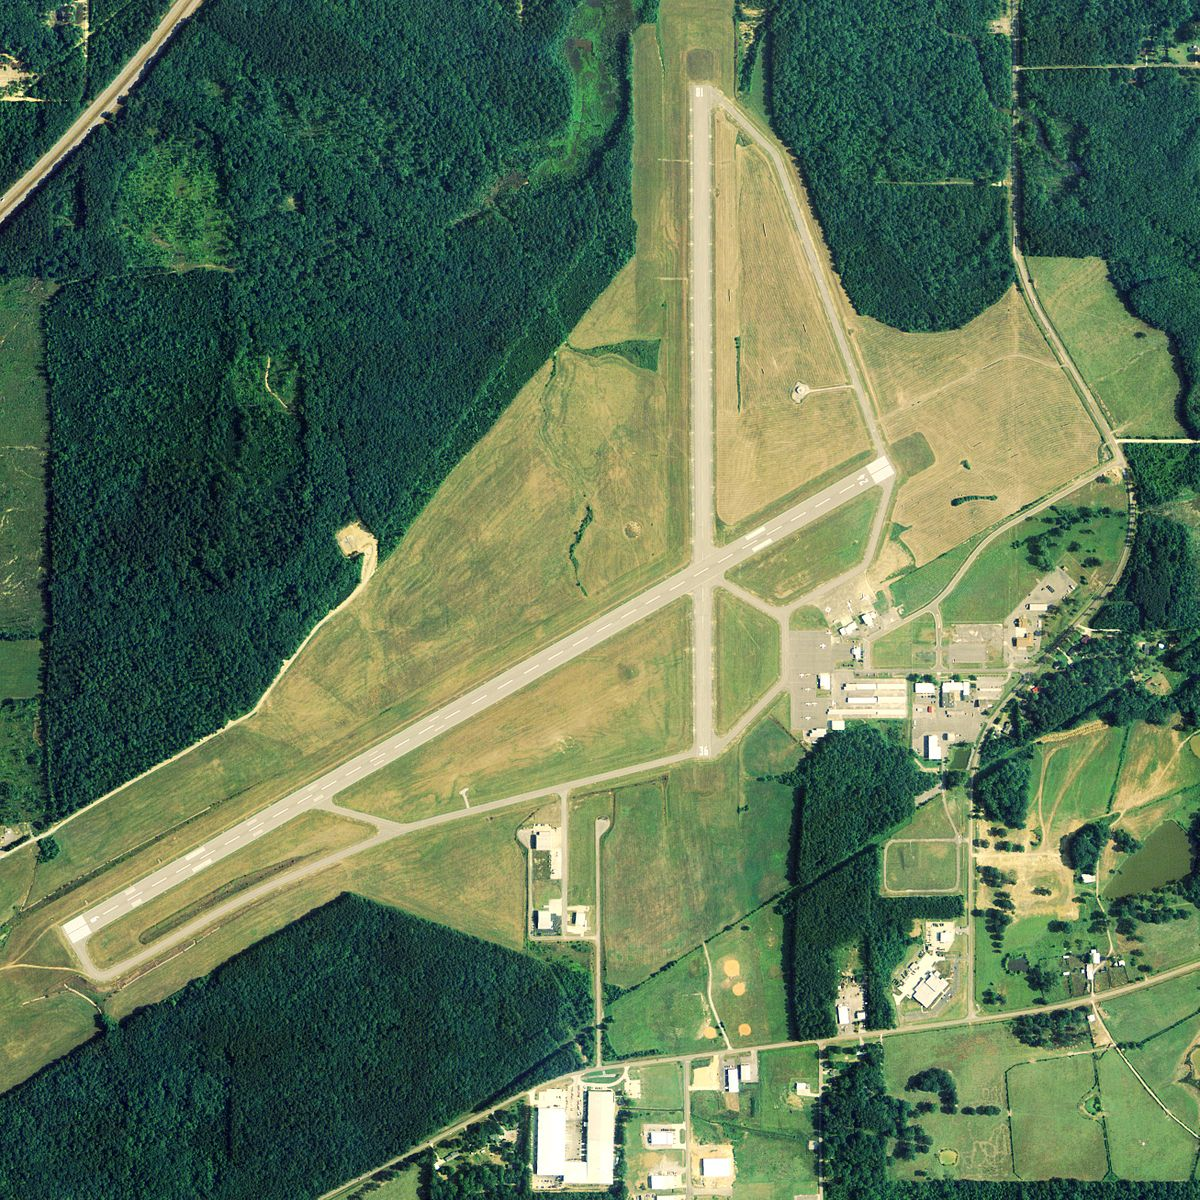 Northeast Alabama Regional Airport Wikipedia - Alabama airports